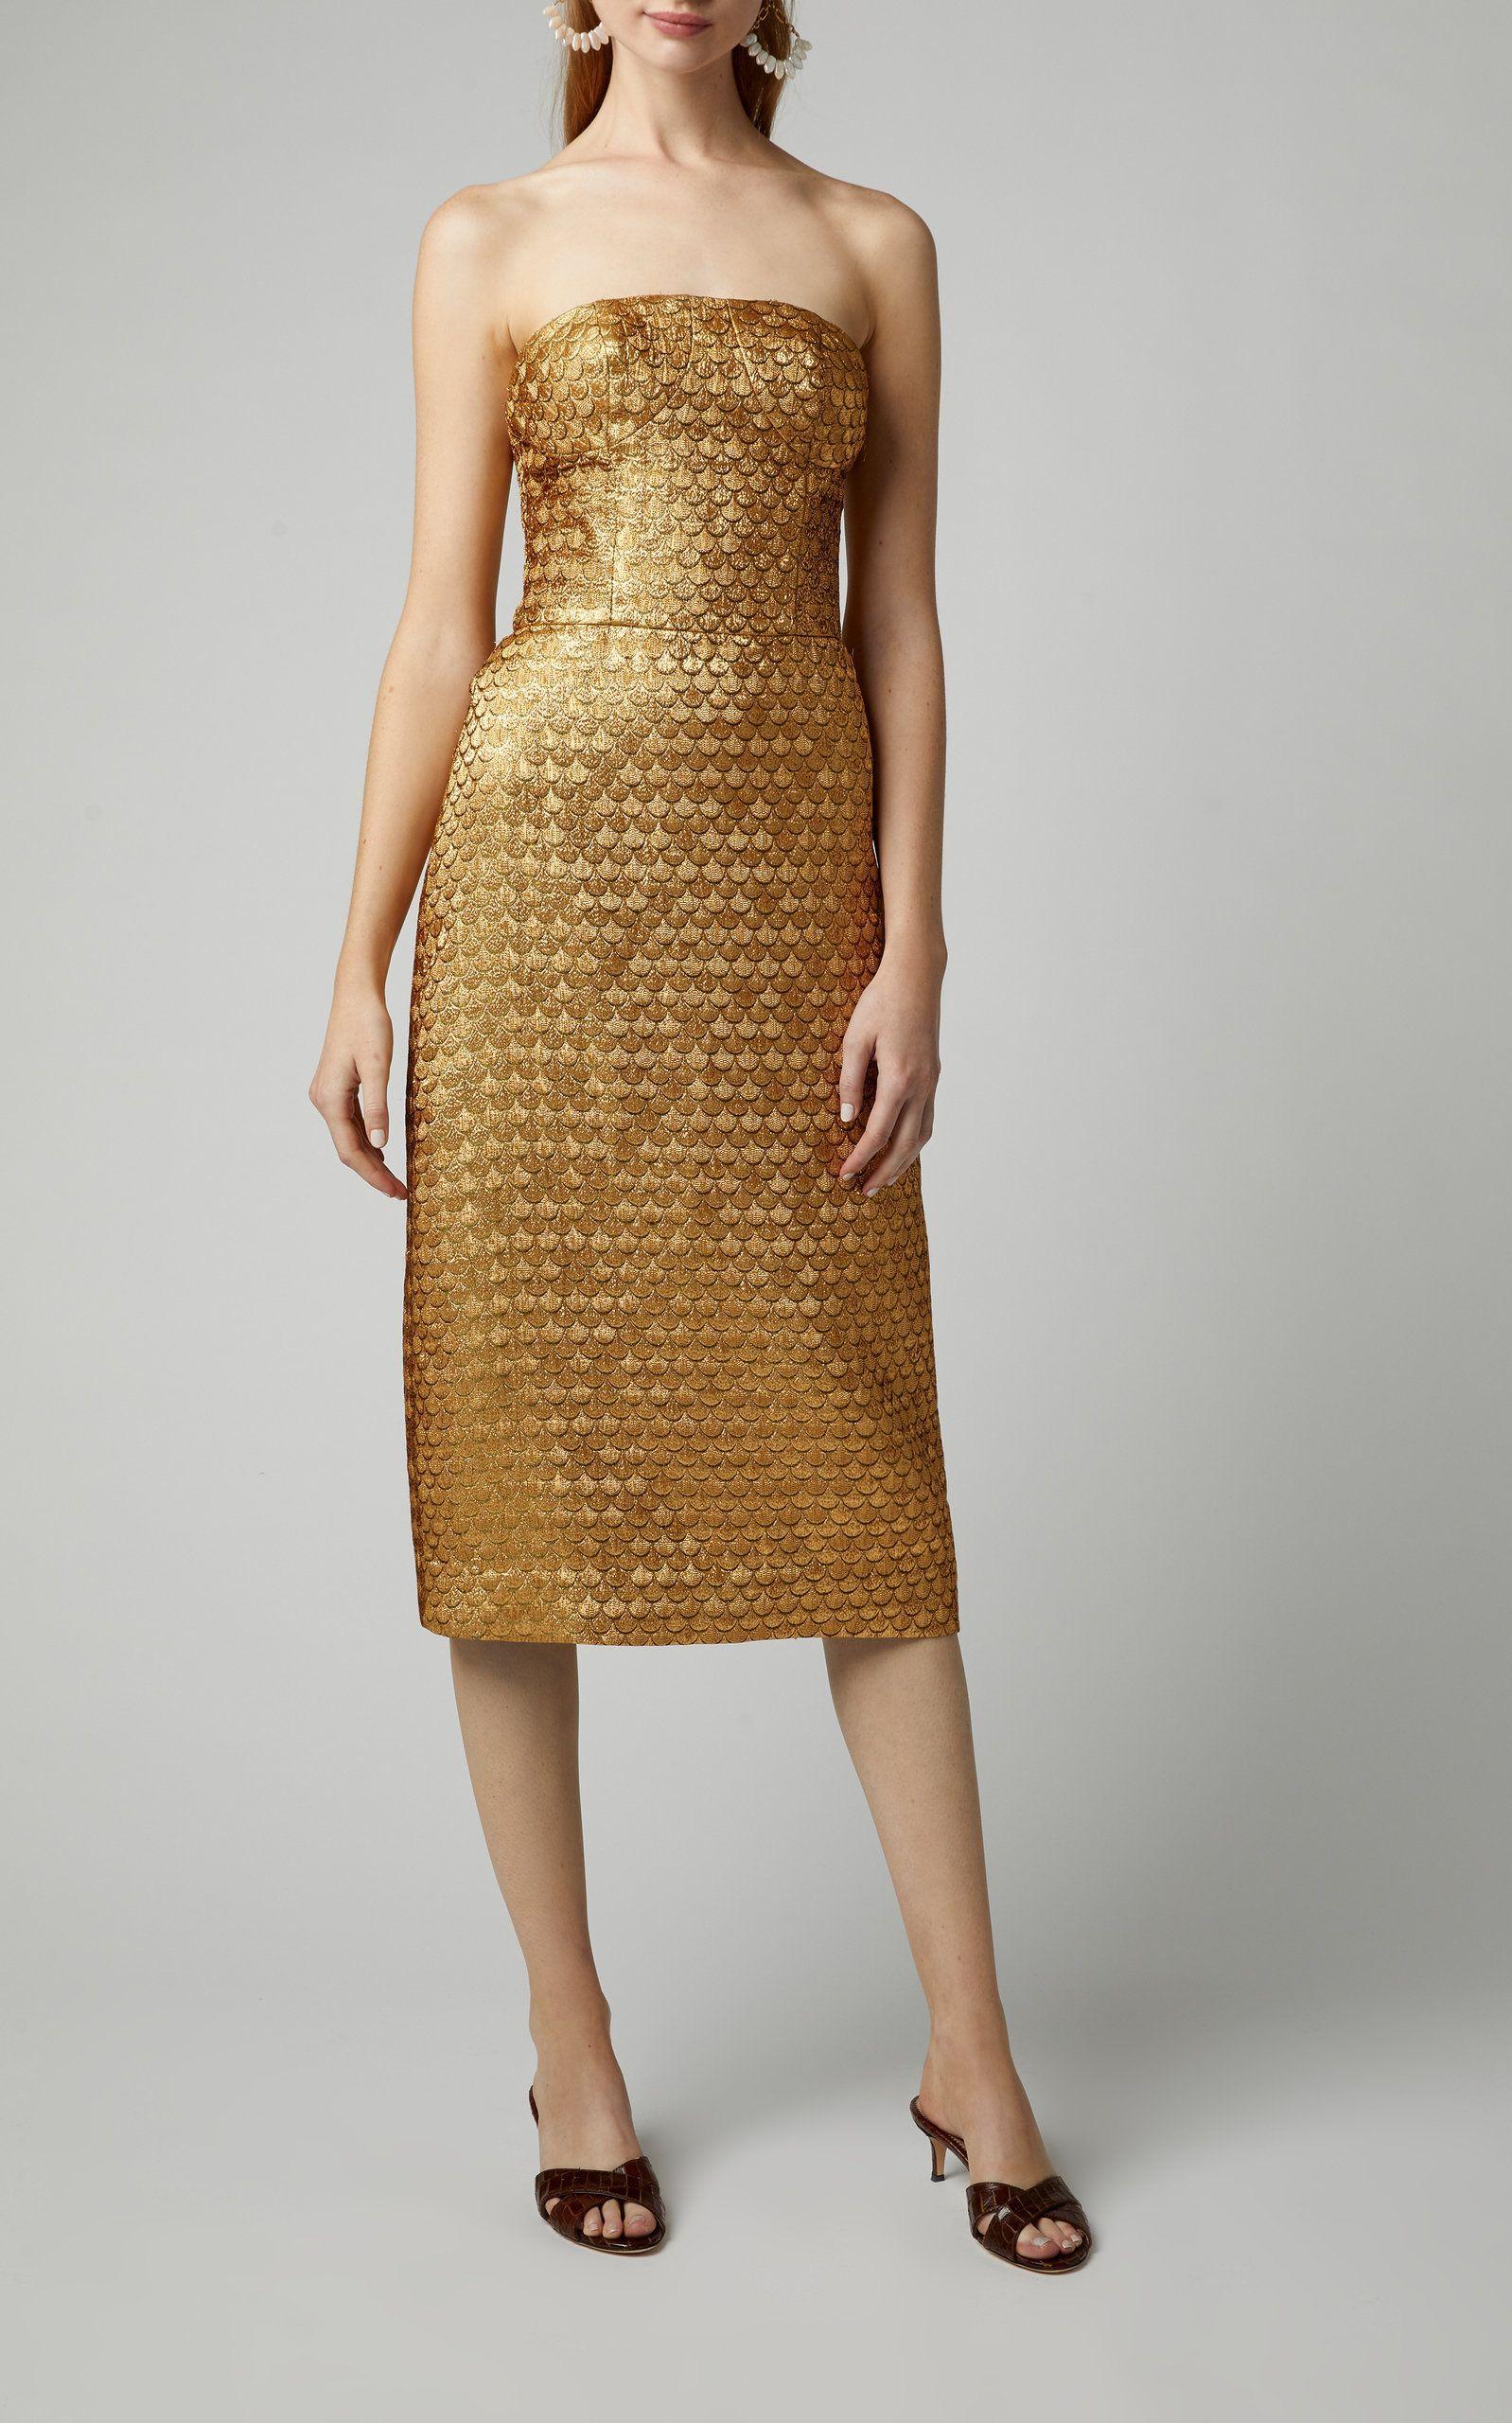 Solid Skinny Strapless Midi Dress For Women Strapless Midi Dress Johanna Ortiz Dresses [ 2560 x 1598 Pixel ]